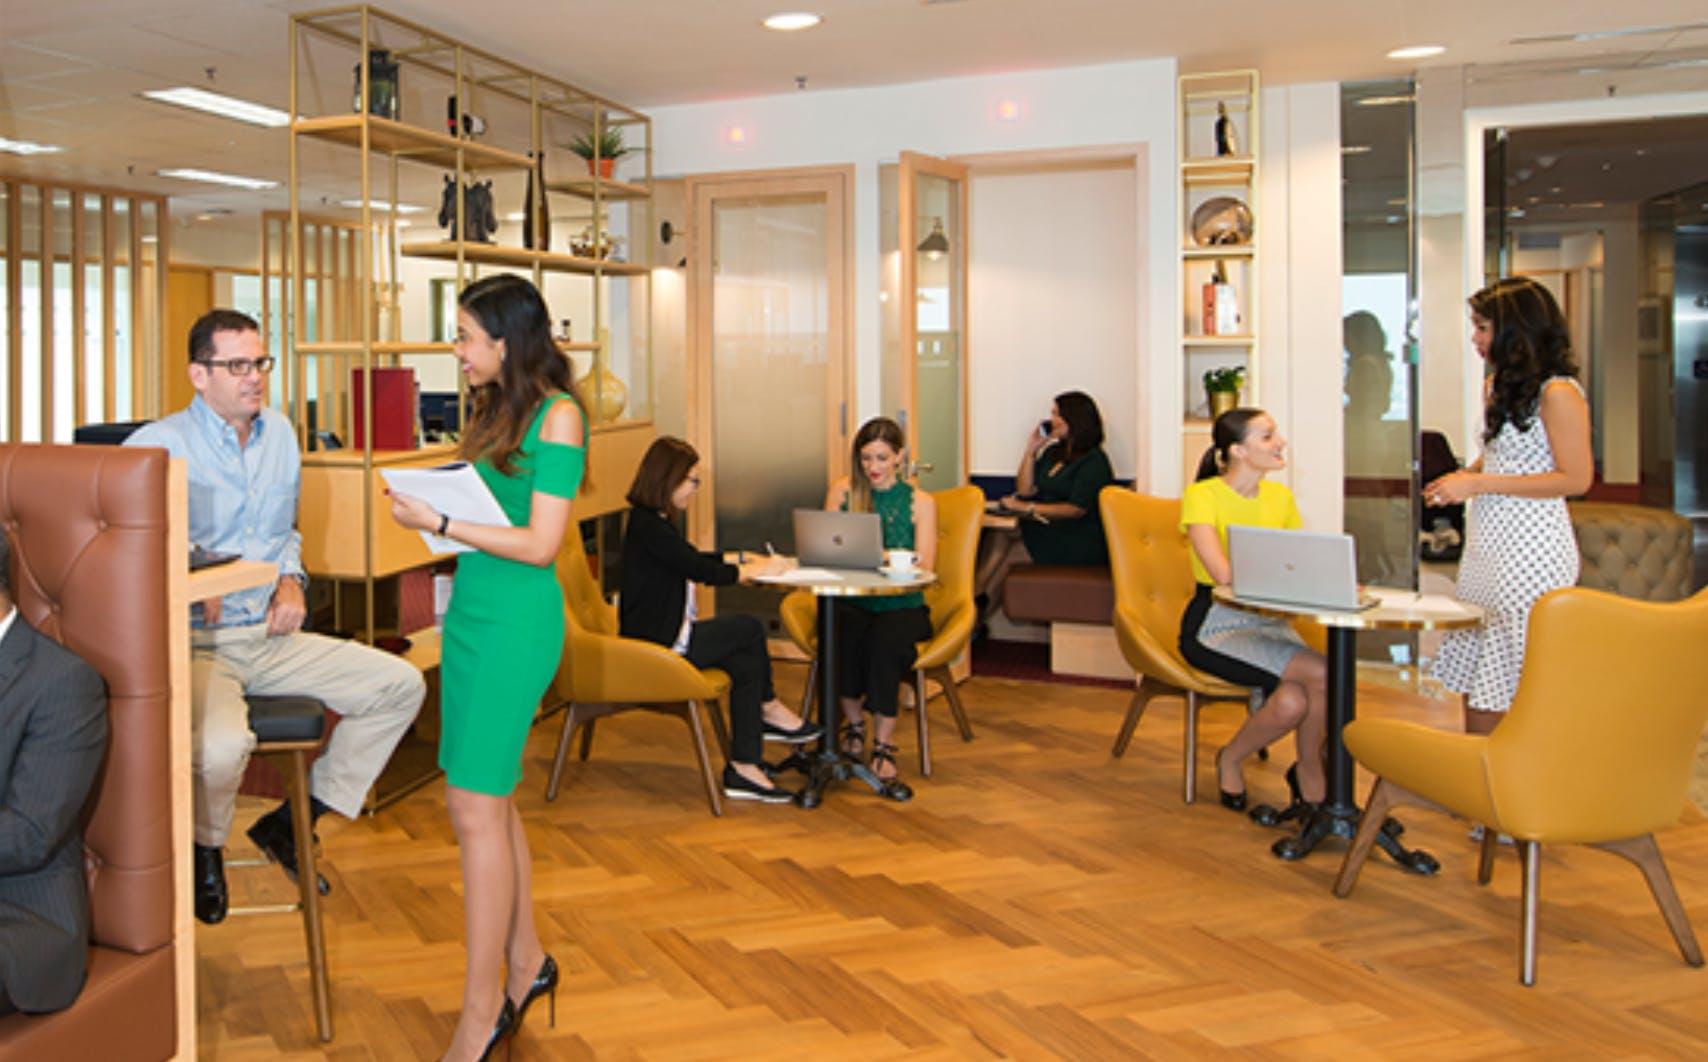 Hot Desk, coworking at Nishi, image 4